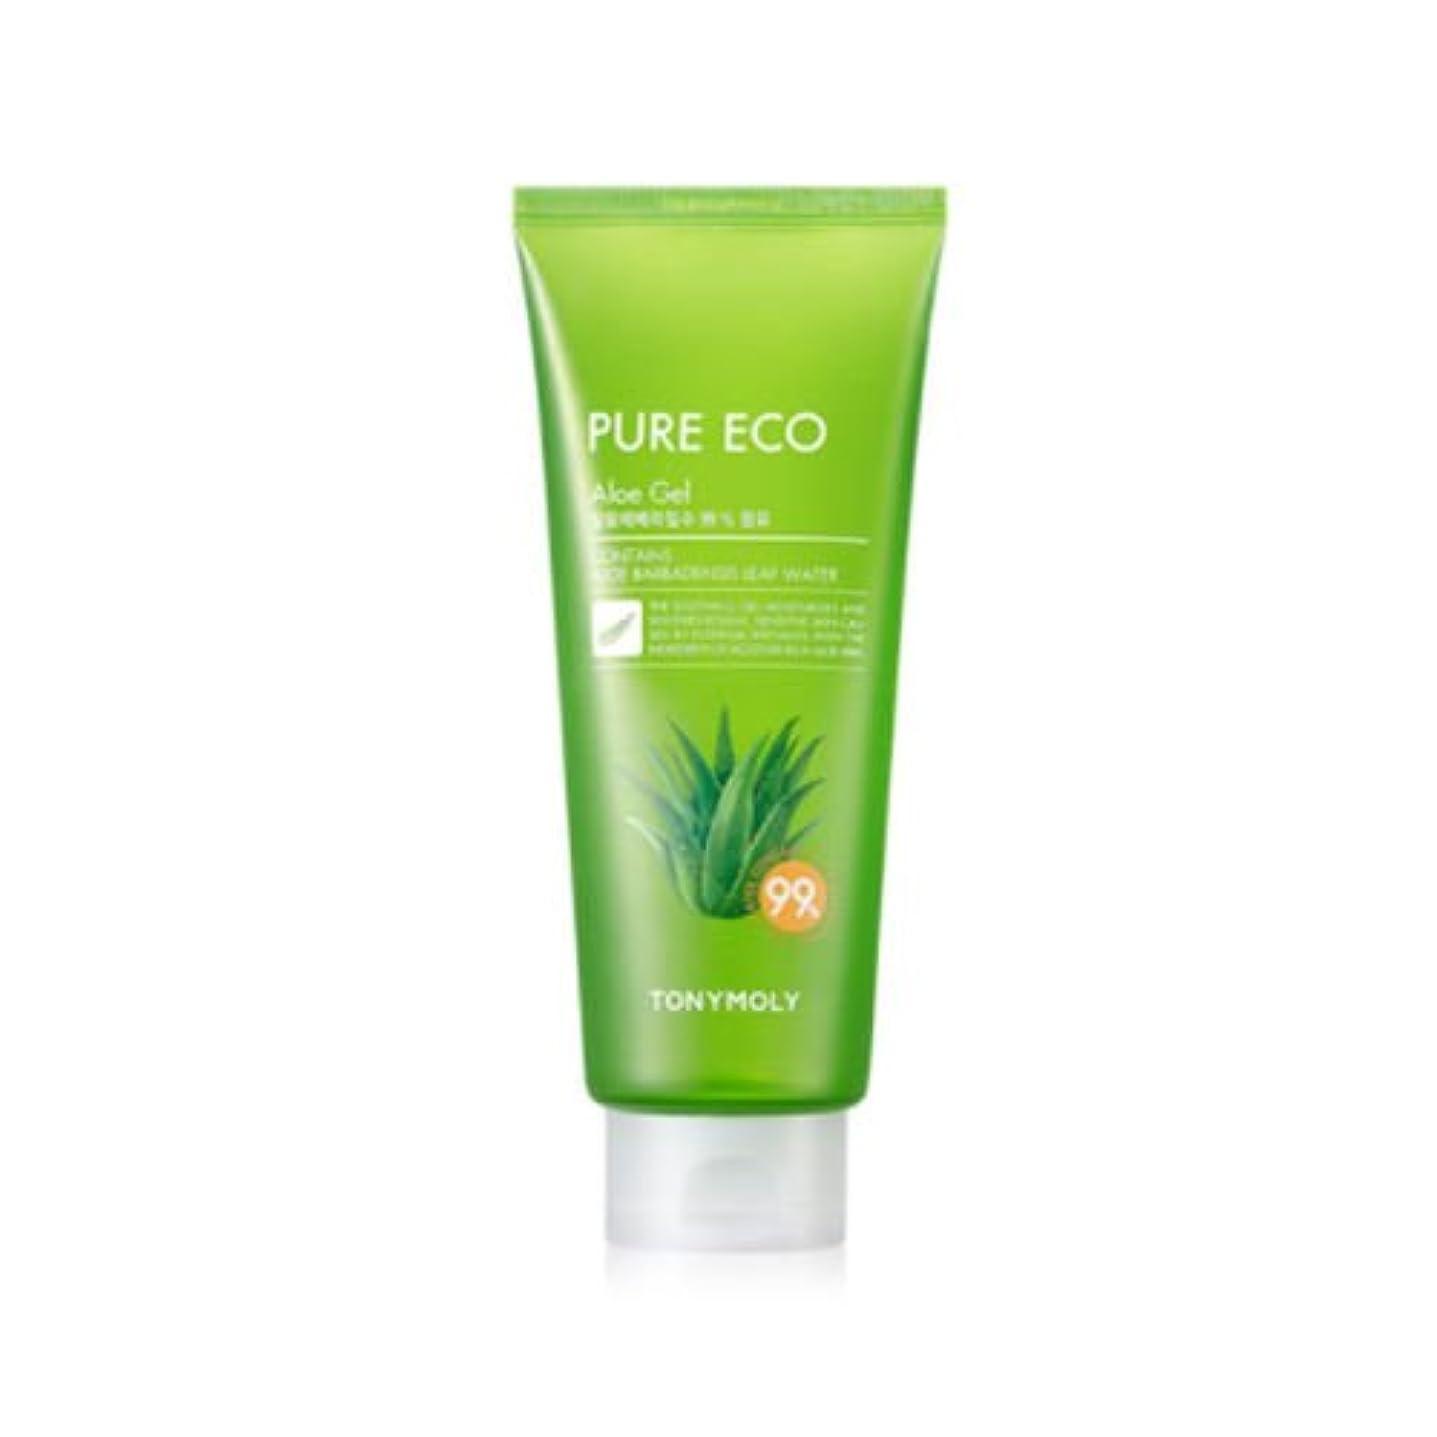 TONYMOLY Pure Eco Aloe Gel (Tube) (並行輸入品)